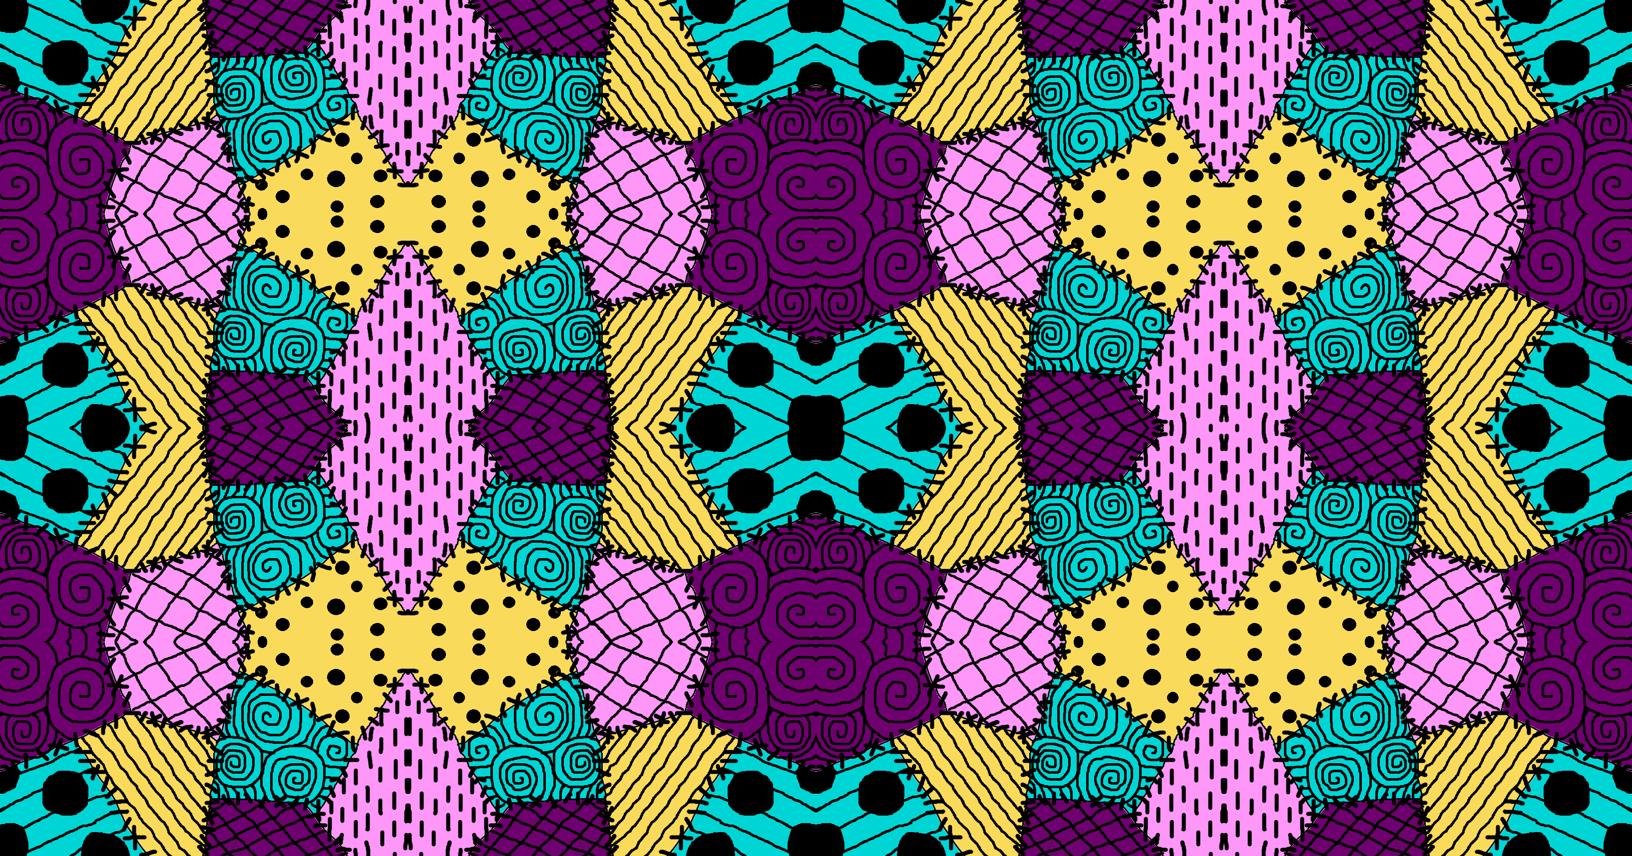 Sally fabric - earsbydede - Spoonflower